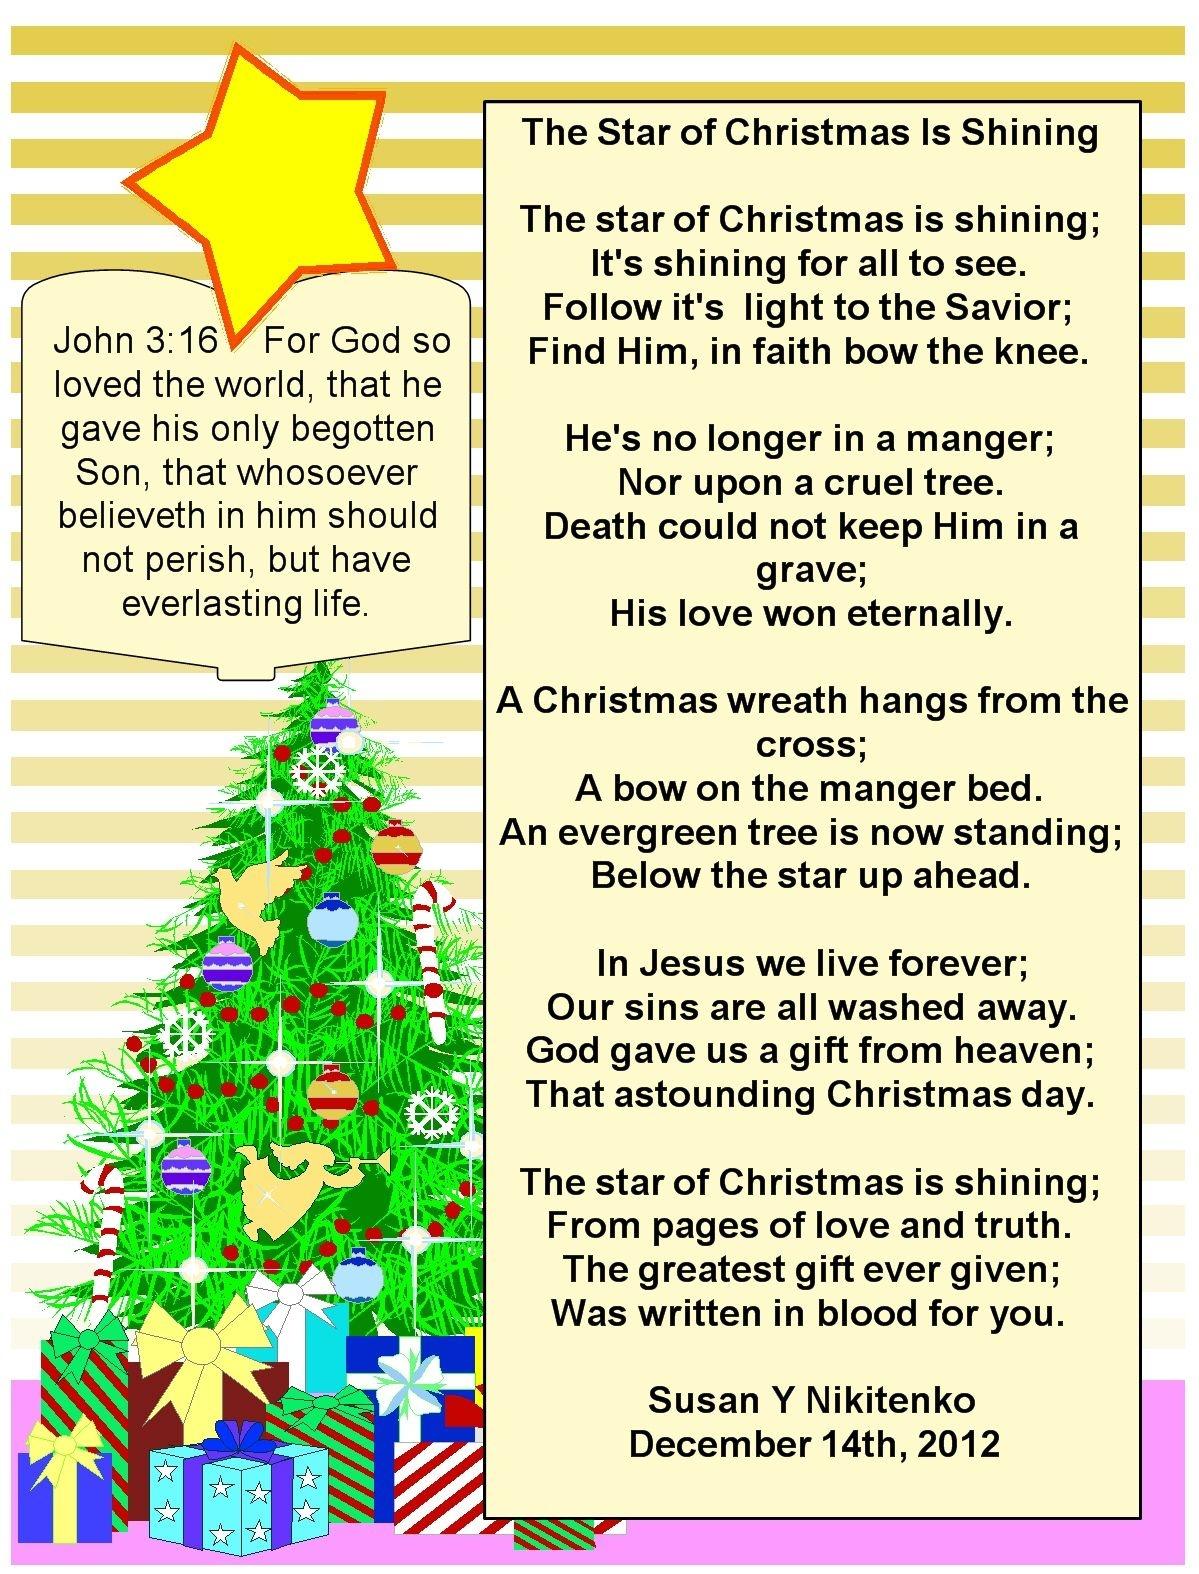 Inspirational Christian Christmas Poems | Christmas Poems | Merry - Free Printable Christian Christmas Poems